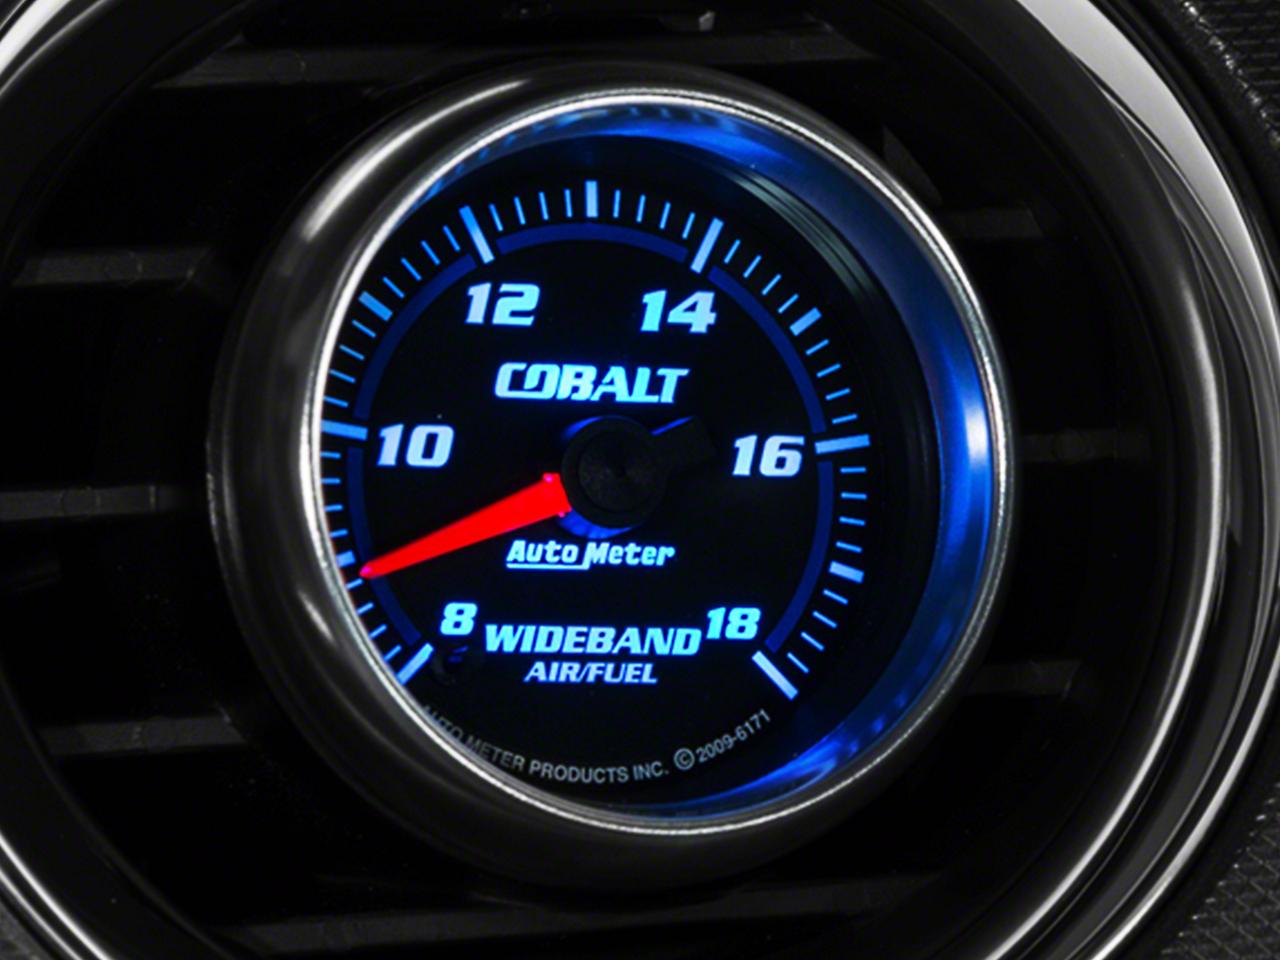 Auto Meter Cobalt Wideband Air/Fuel Ratio Gauge - Analog (79-14 All)